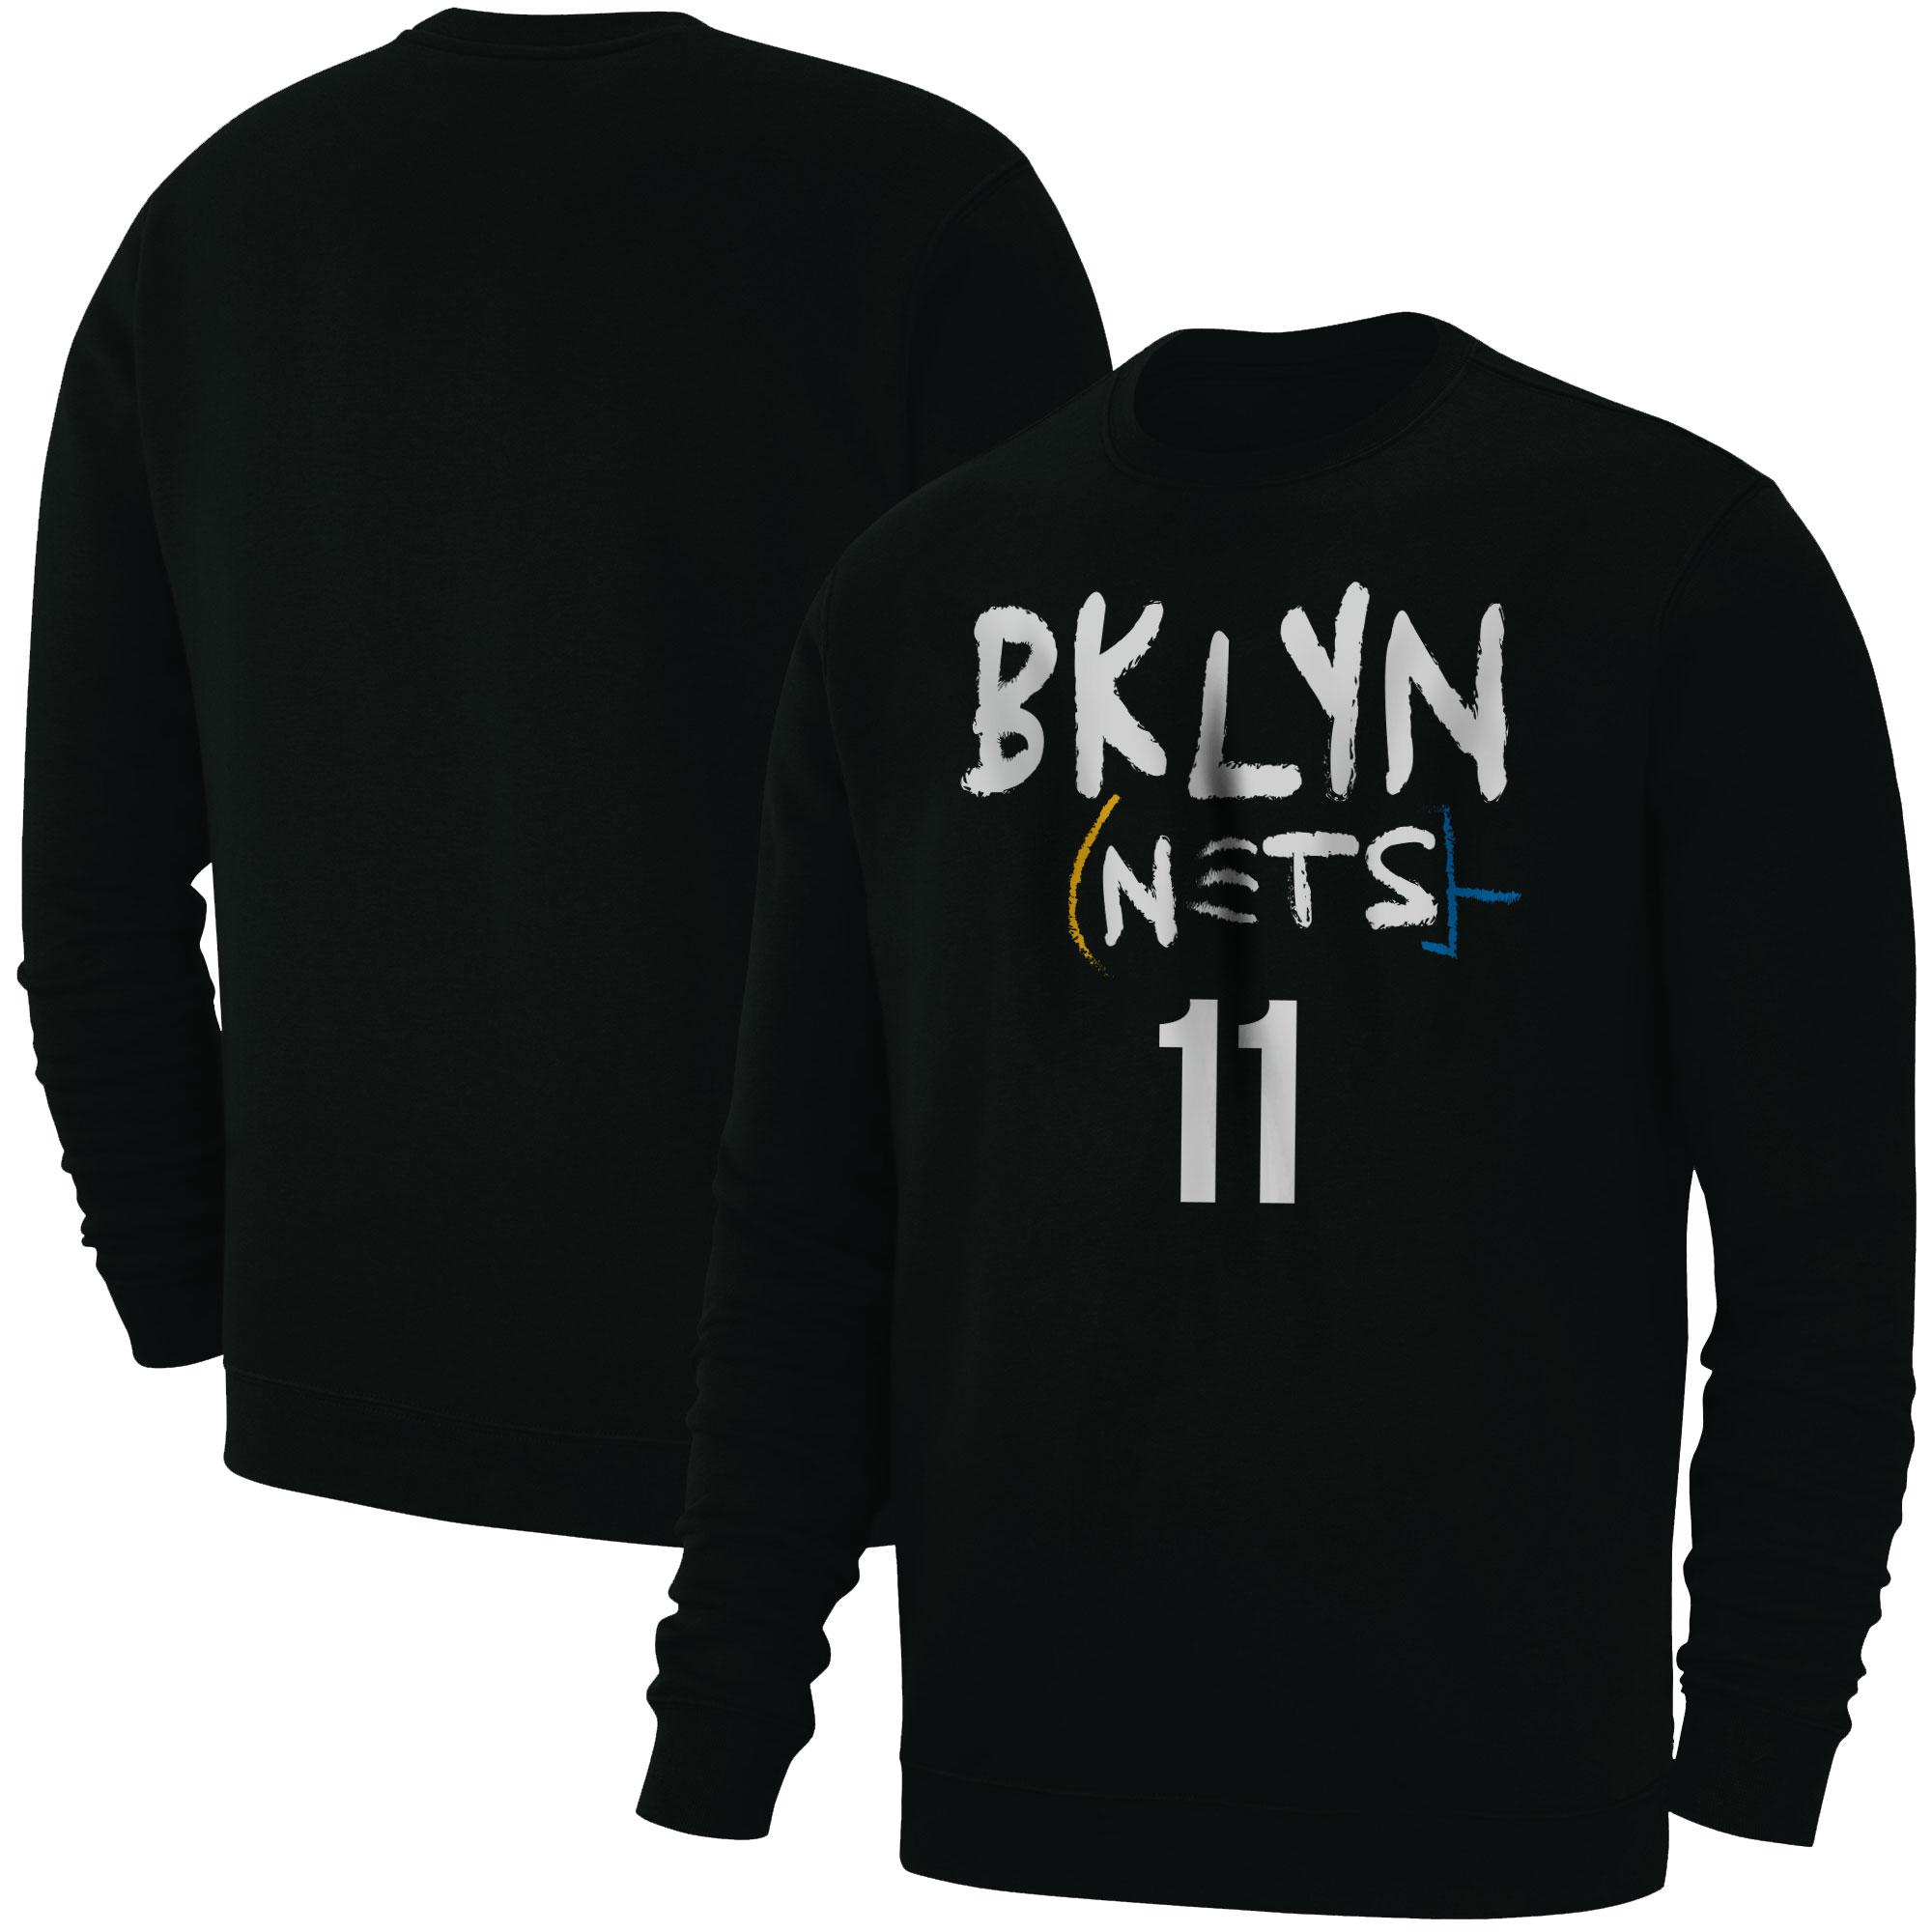 Brooklyn Nets Kyrie Irving Basic  (BSC-BLC-PLT-492-11)